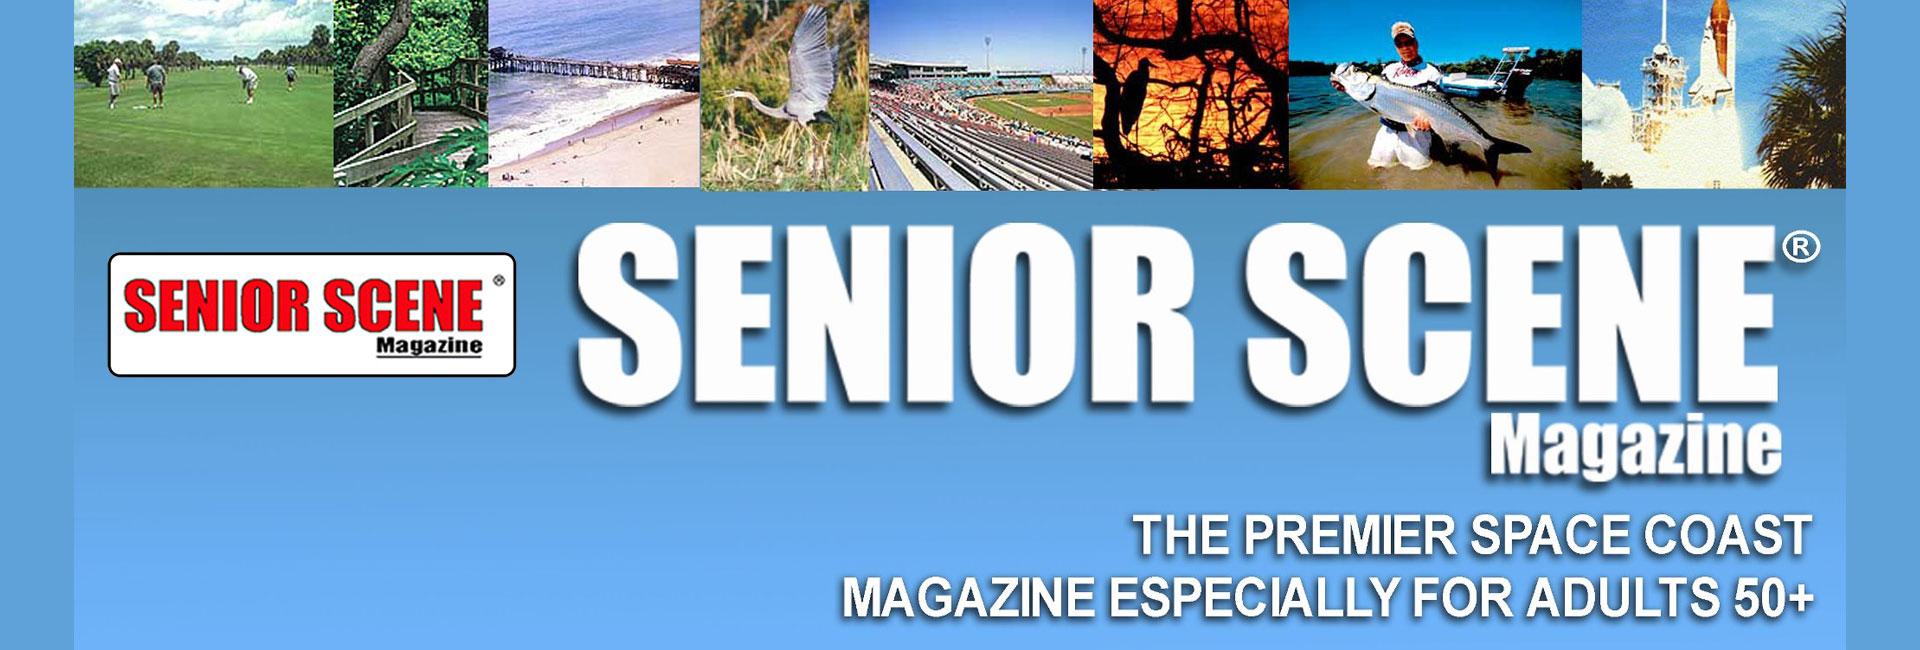 About Senior Scene